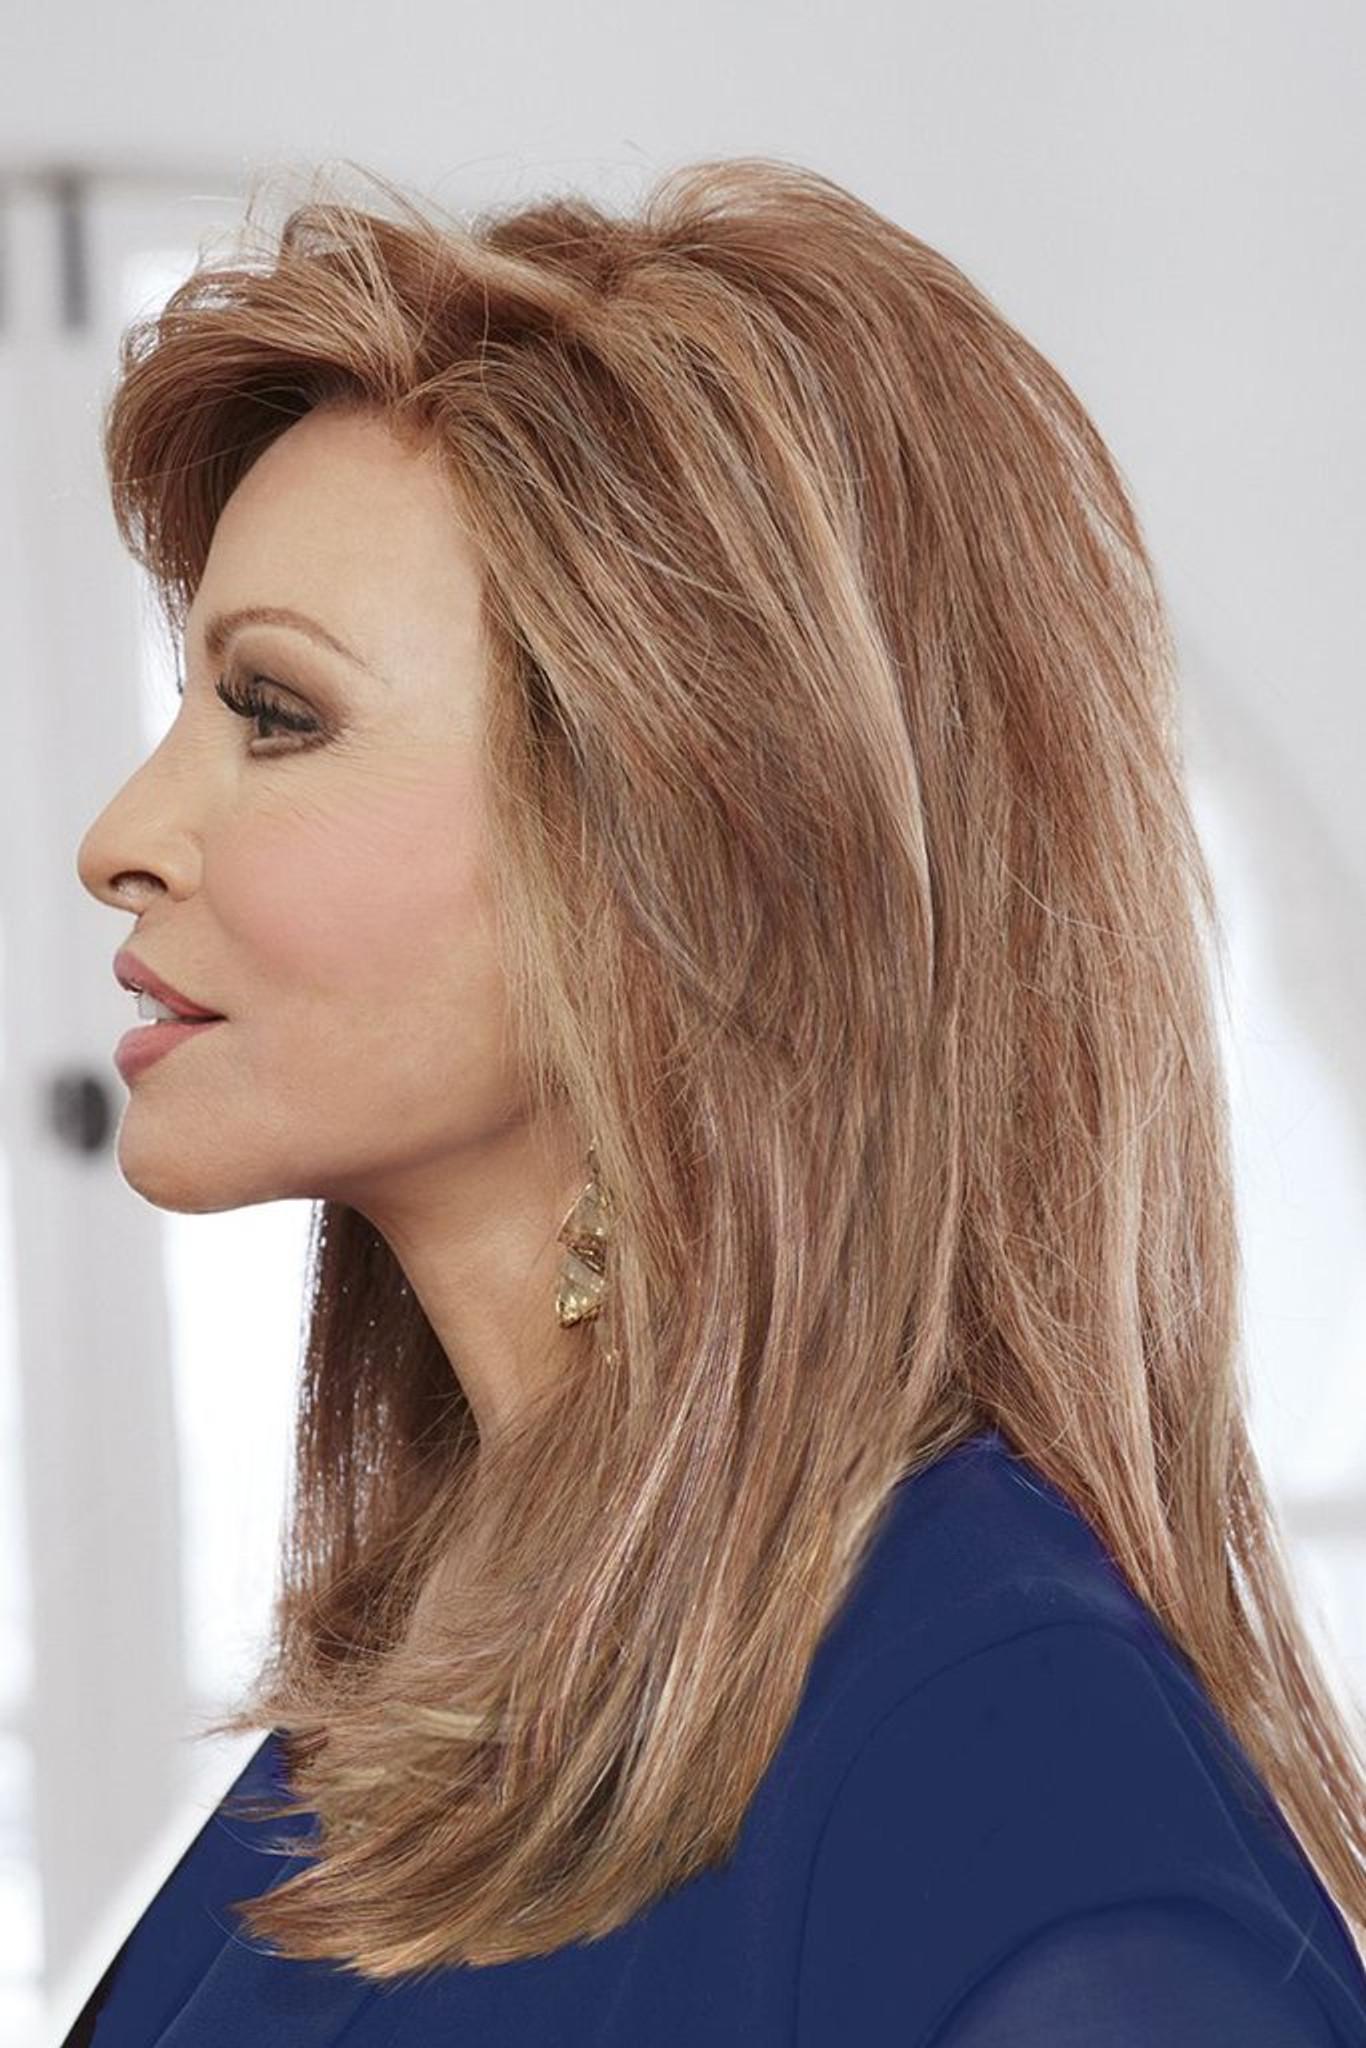 High Fashion Raquel Welch Wigs Side View